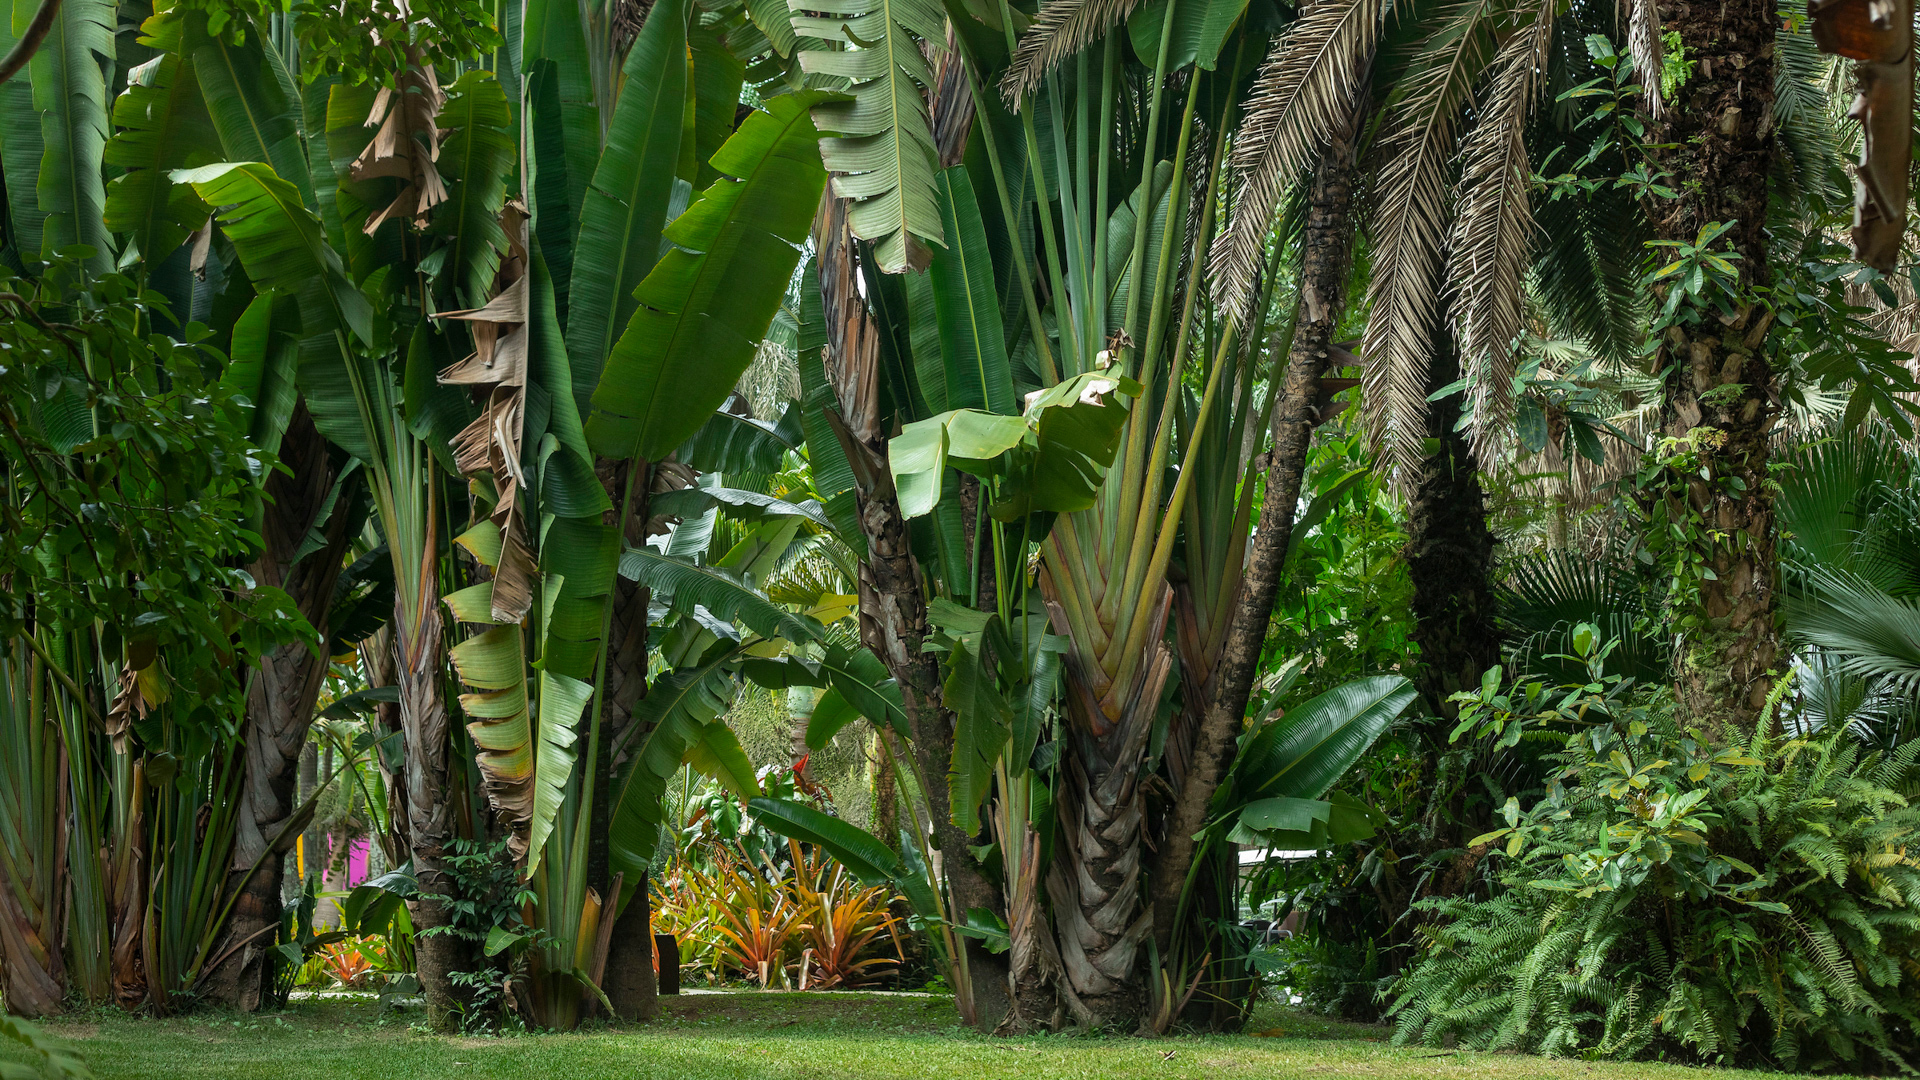 Árvore-do-viajante Inhotim